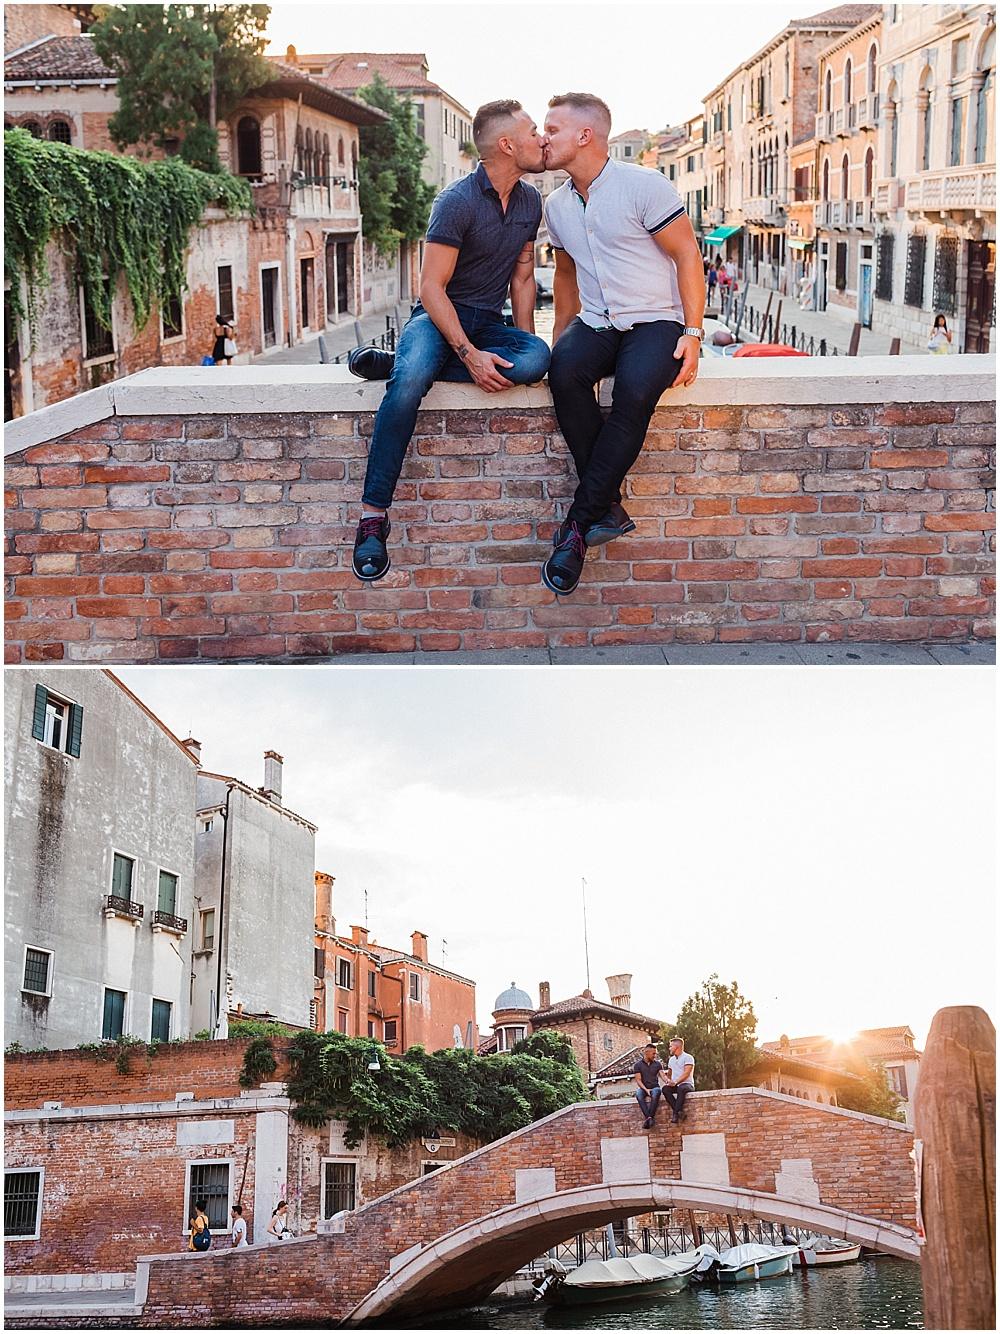 venice-italy-couple-photograher-stefano-degirmenci_0378.jpg